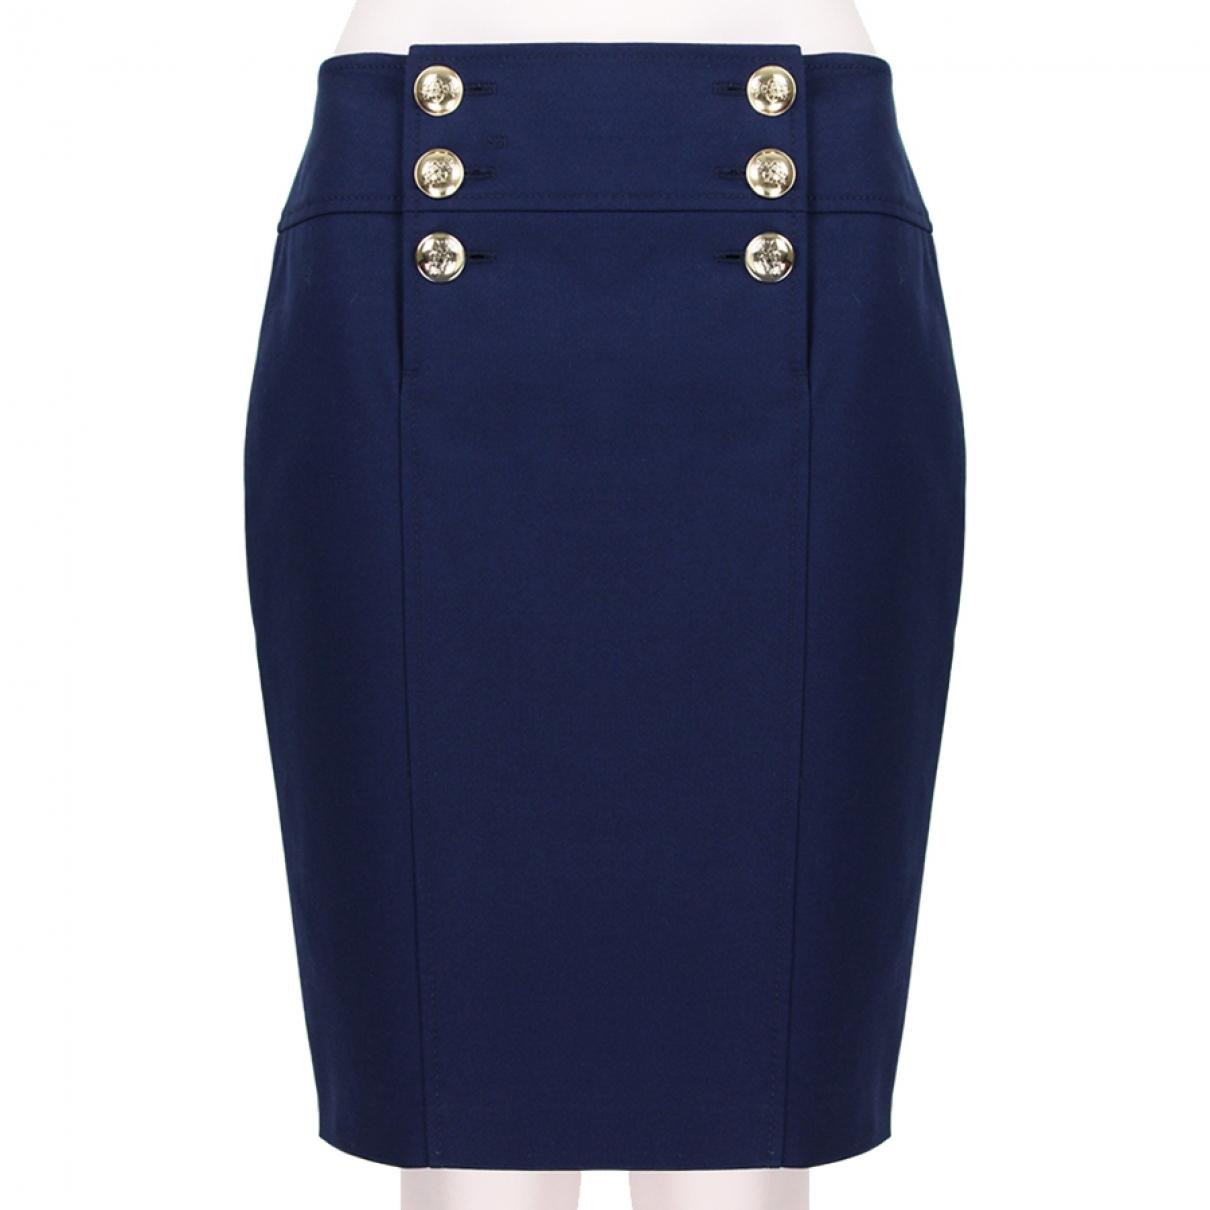 Emilio Pucci \N Blue Cotton skirt for Women 42 IT